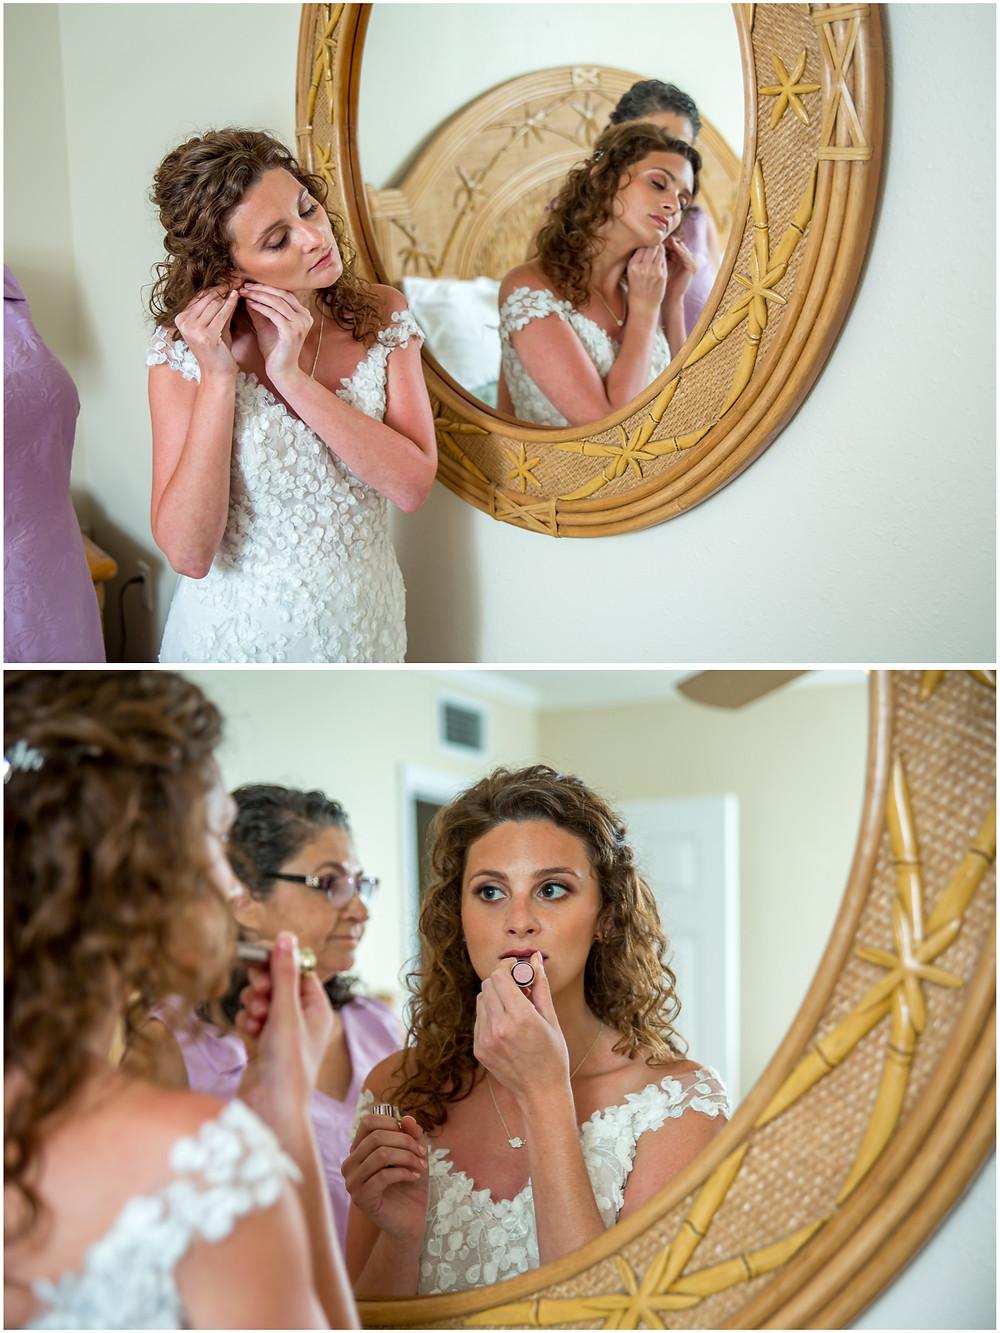 Anna Maria Island Wedding Photographer getting ready details at Cedar Cove Resort